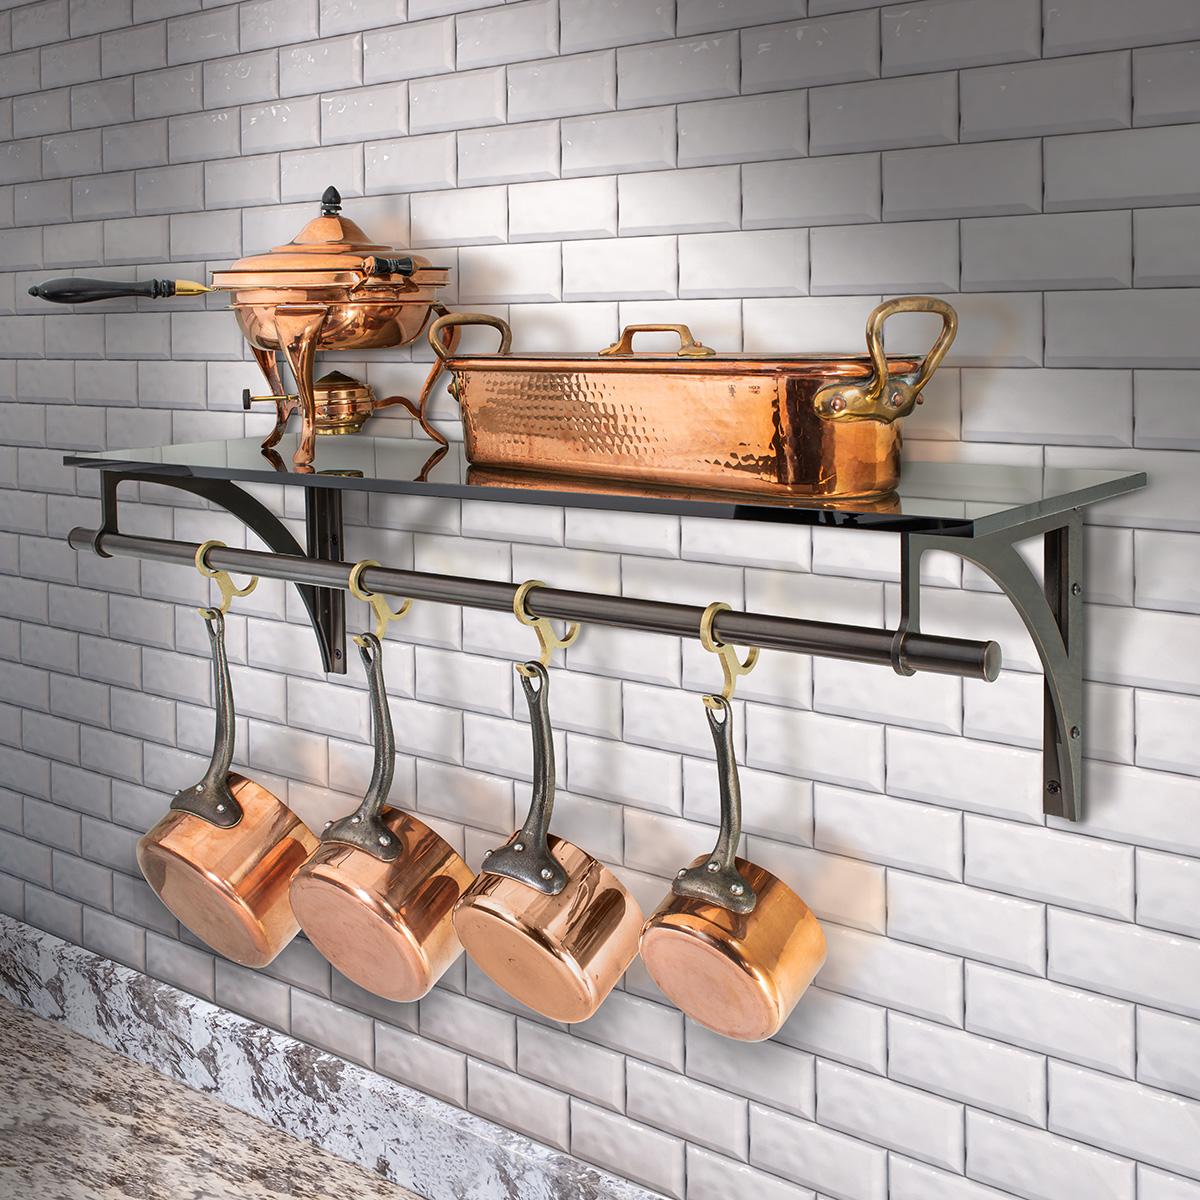 1220-Regency Style Kitchen Shelf